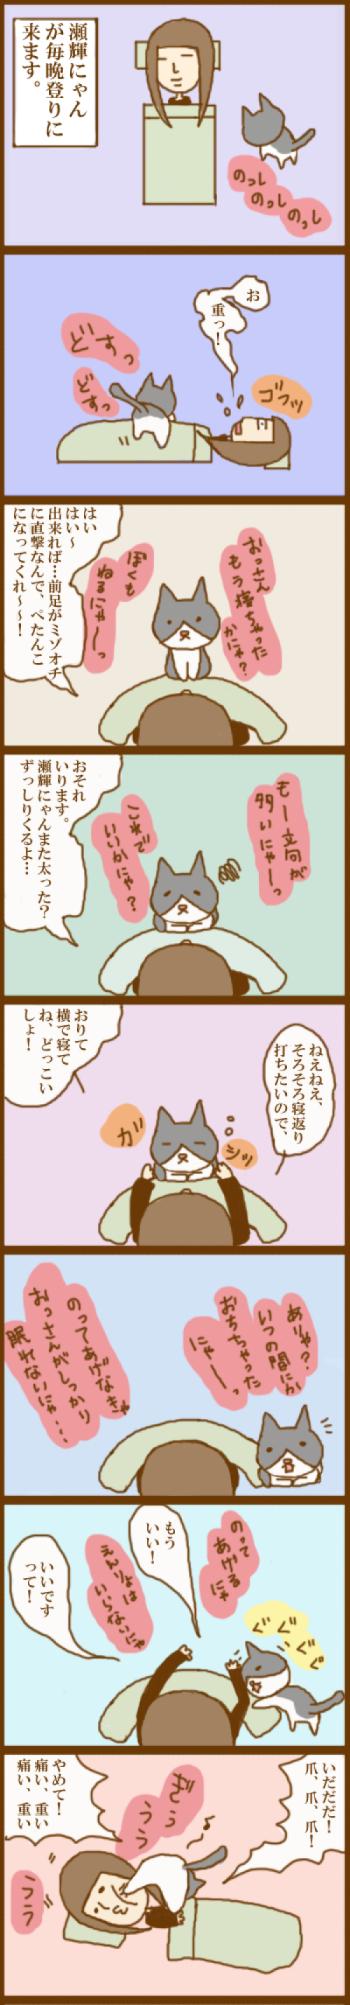 f:id:suzuokayu:20201117094603j:plain